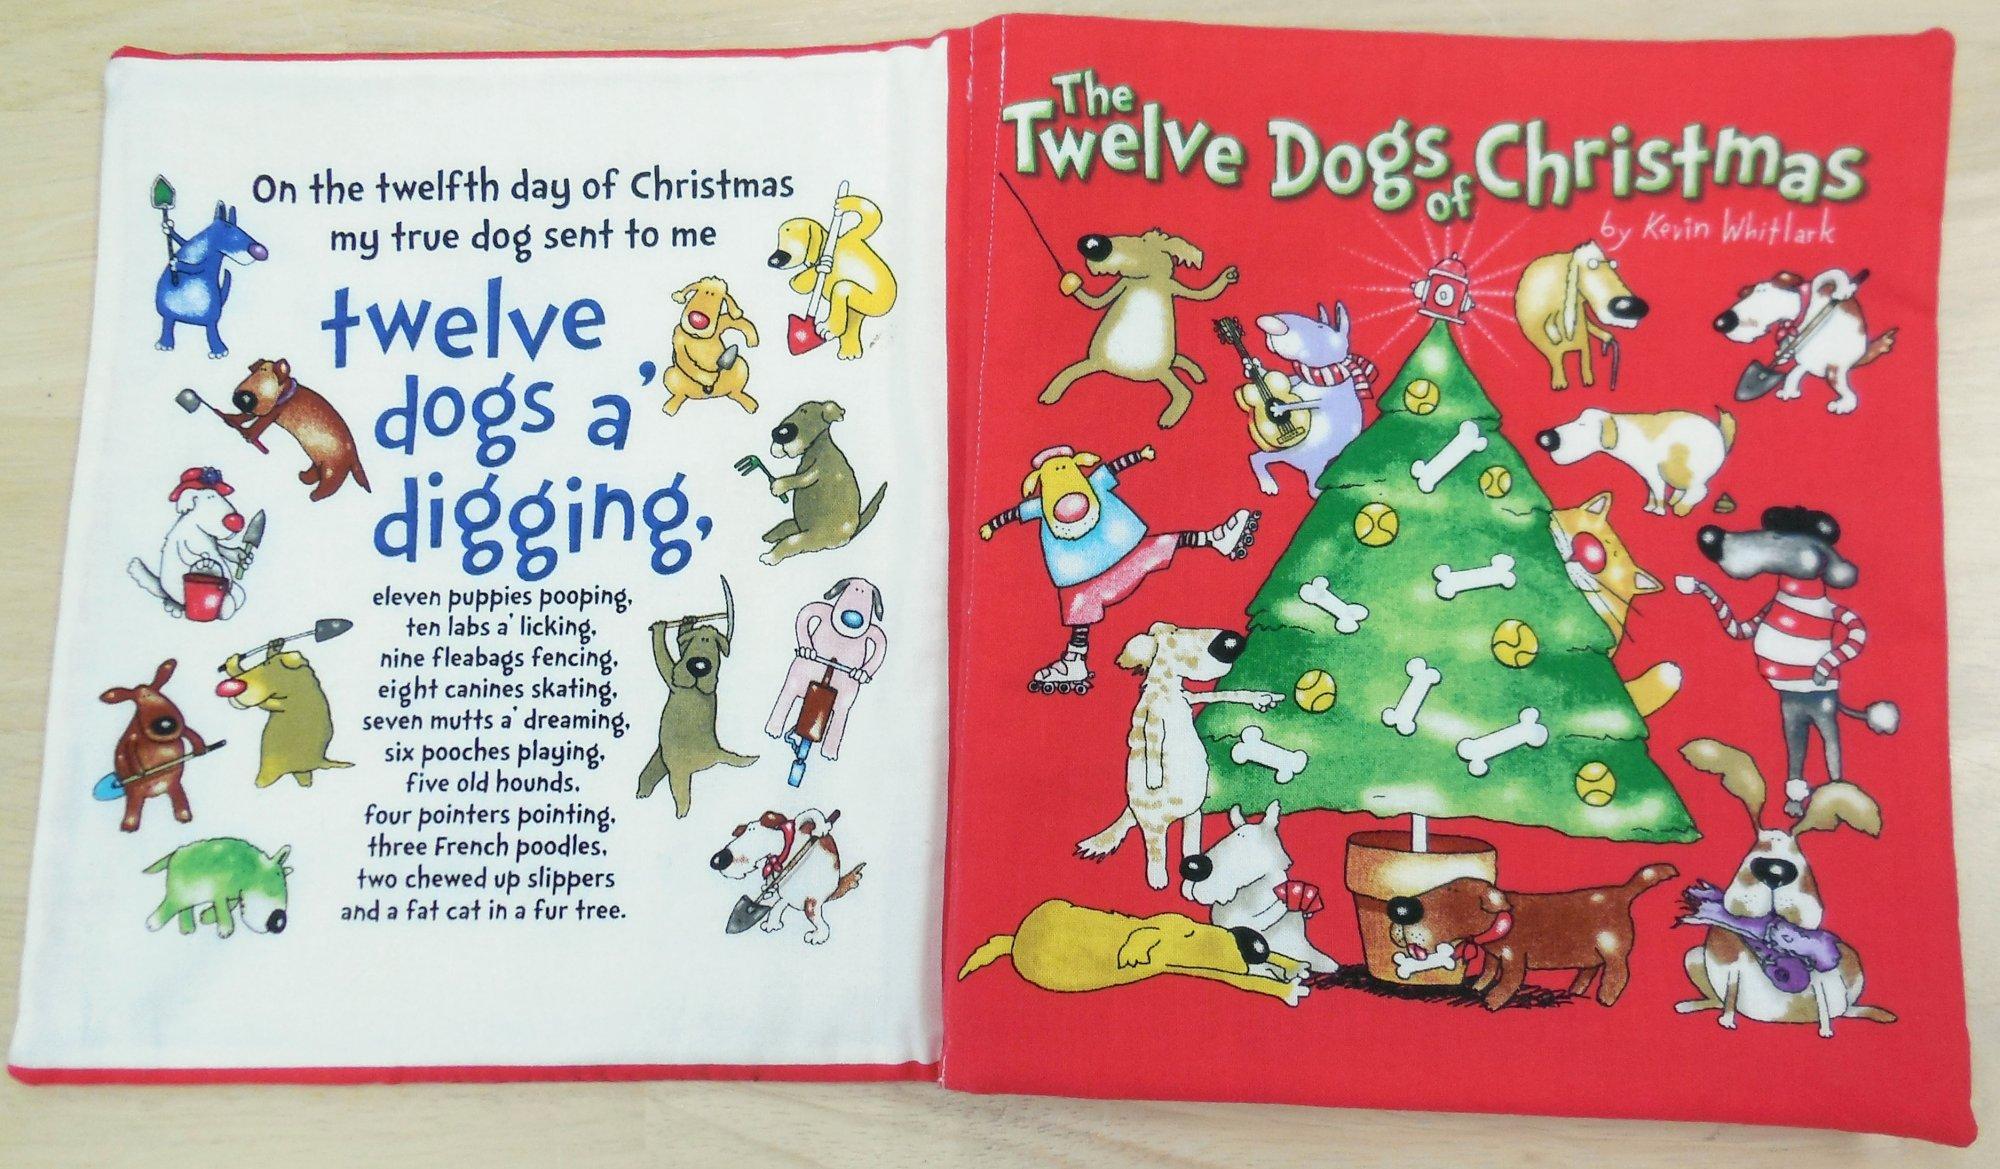 12 Dogs Of Christmas.12 Dogs Of Christmas Book Panel